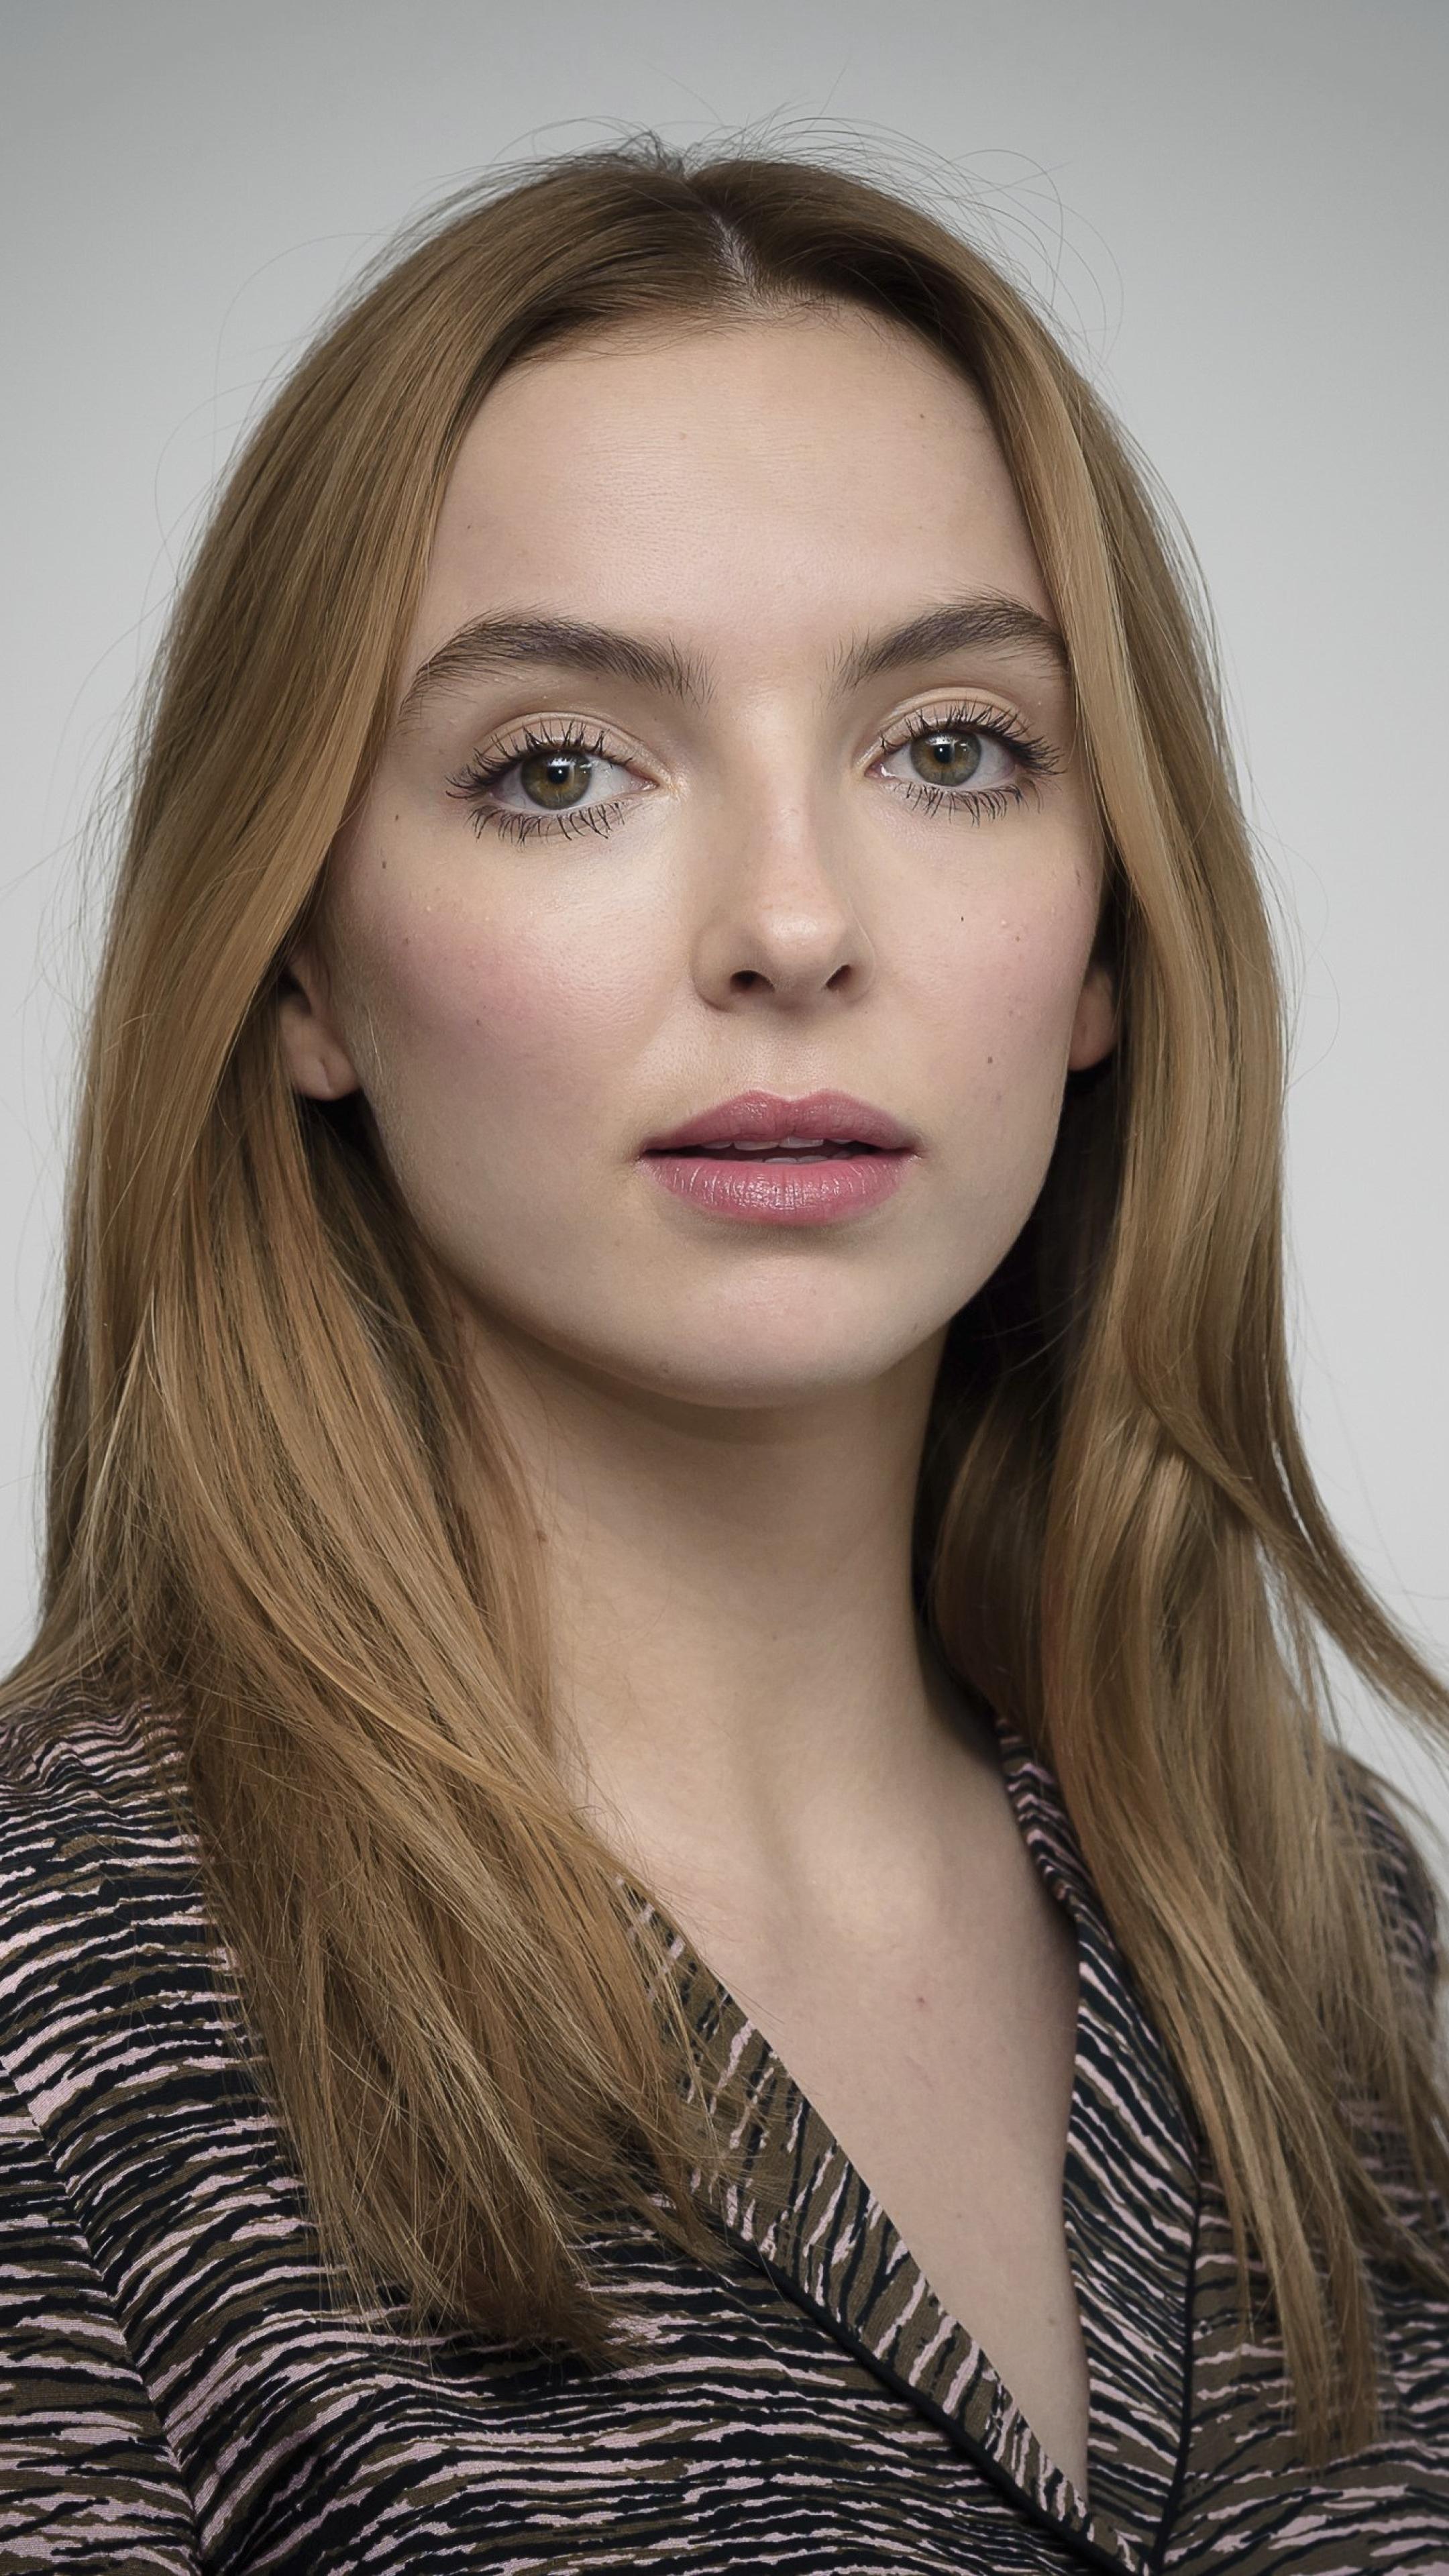 Jodie Comer Killing Eve Actress, HD 4K Wallpaper